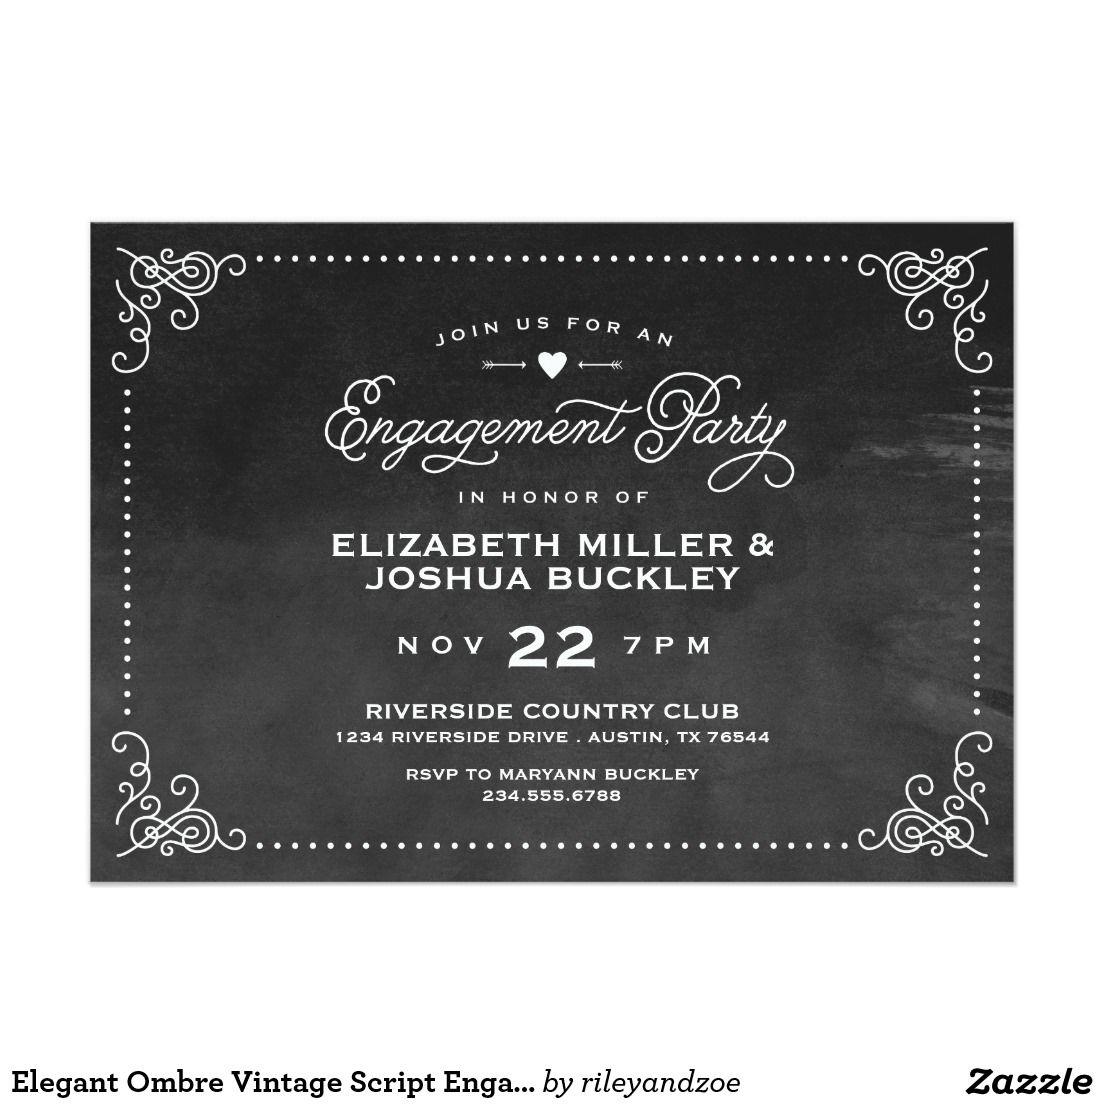 Elegant Ombre Vintage Script Engagement Party Card   Wedding ...